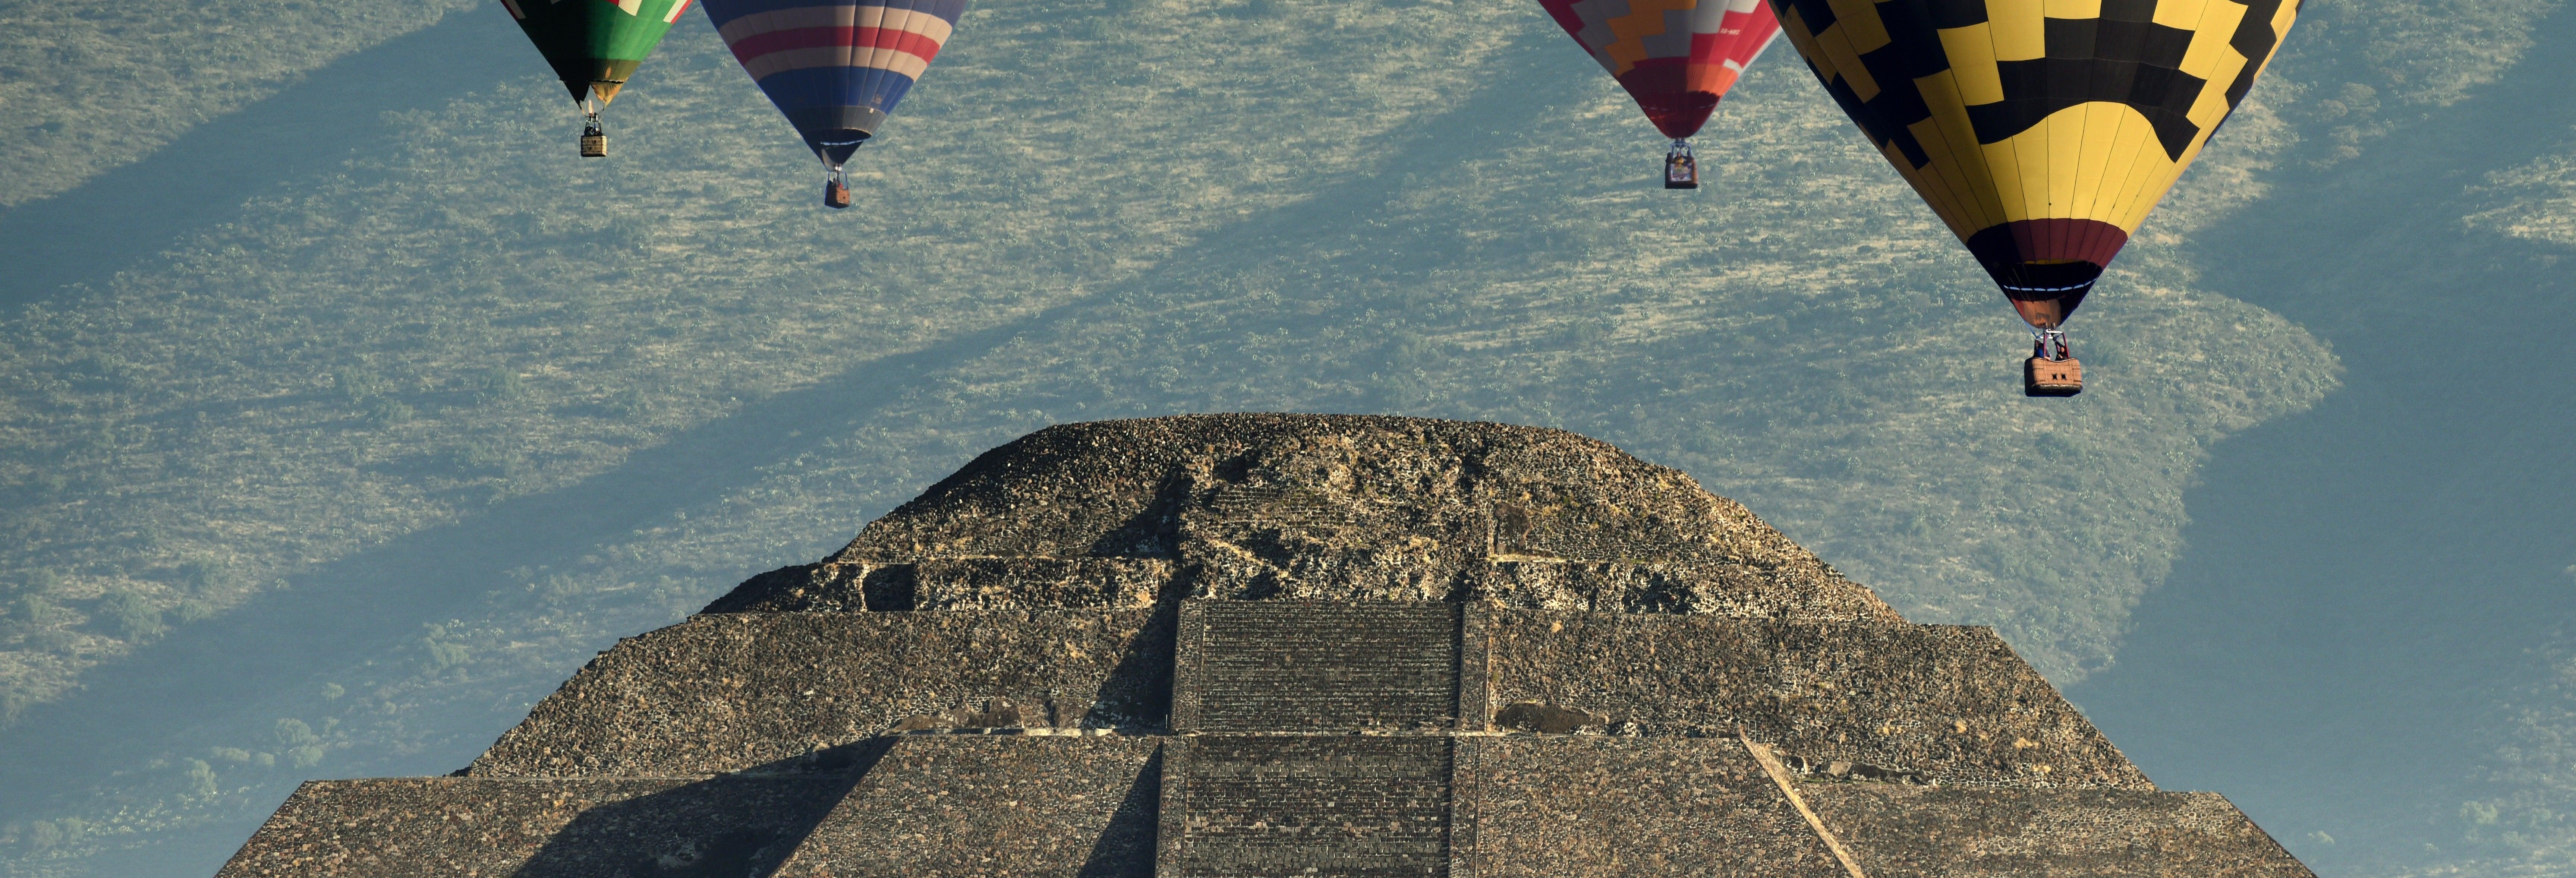 Teotihuacán Hot Air Balloon Ride